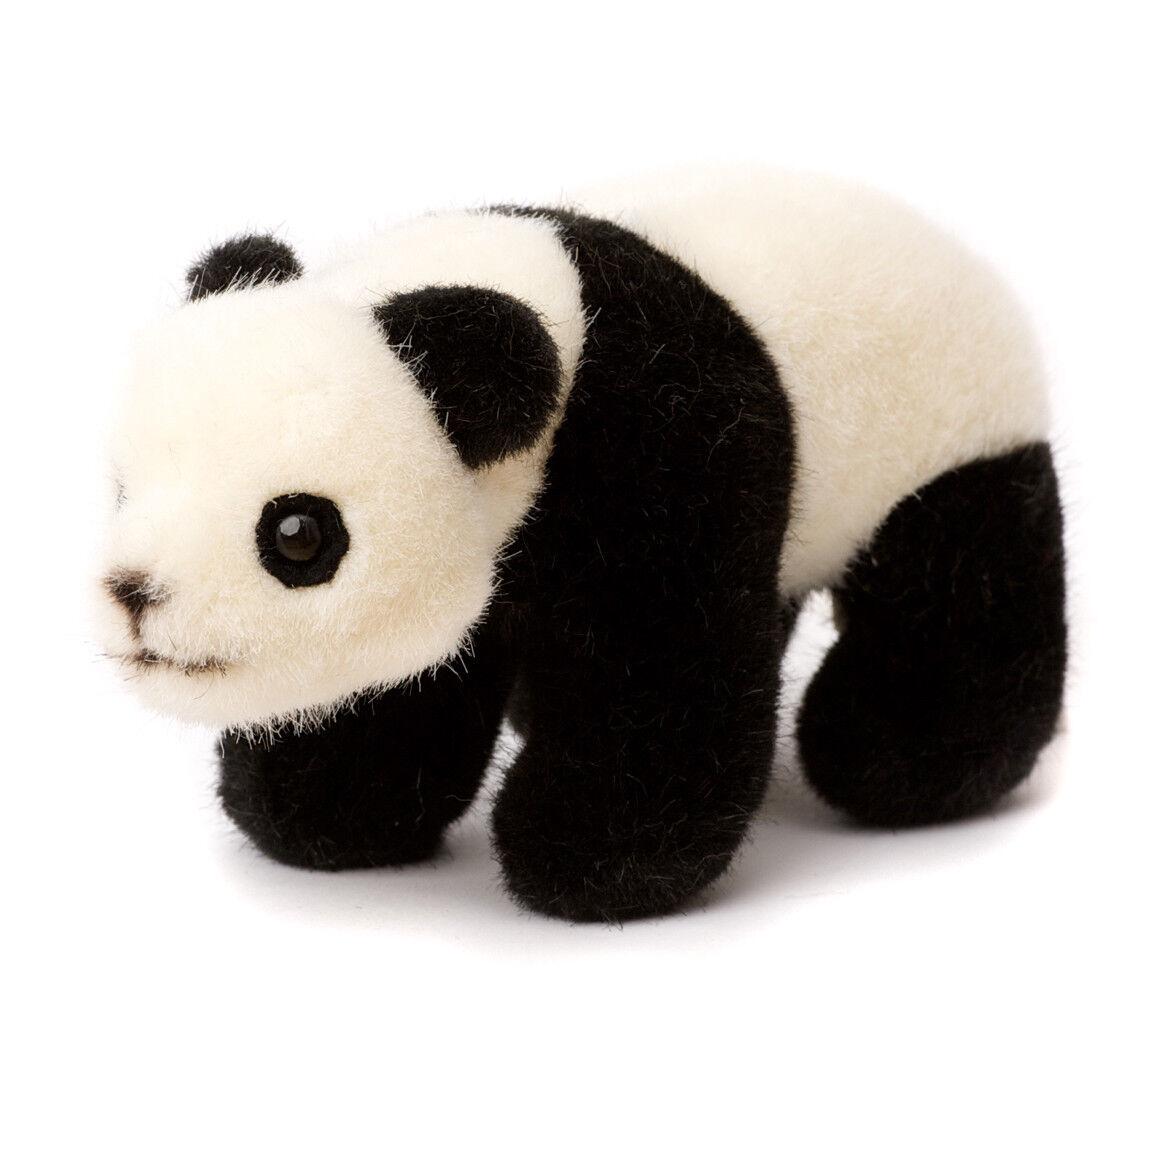 Panda Bear Cub - collectable plush soft toy - Kosen   Kösen - 3200 - 17cm